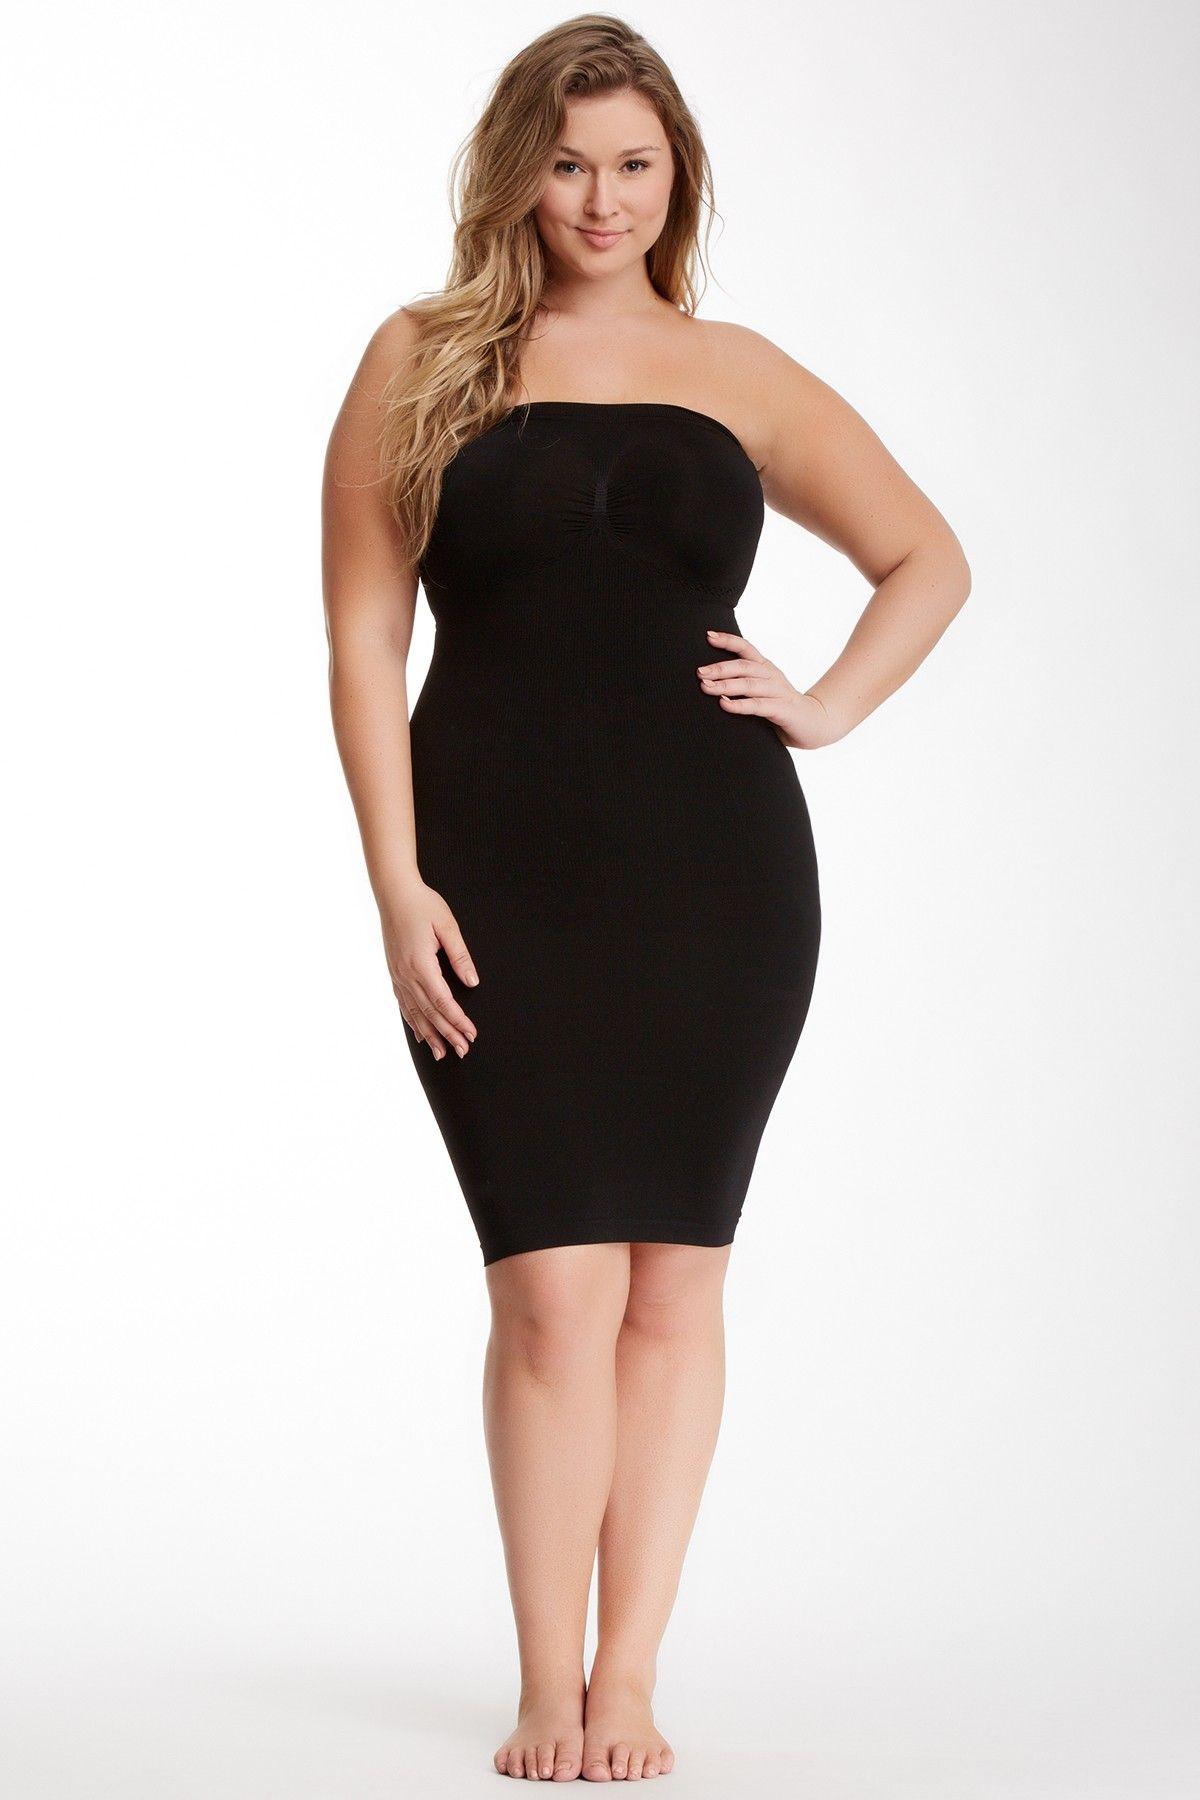 Julie France Shapewear | Regular Strapless Dress Shaper ... - photo#35